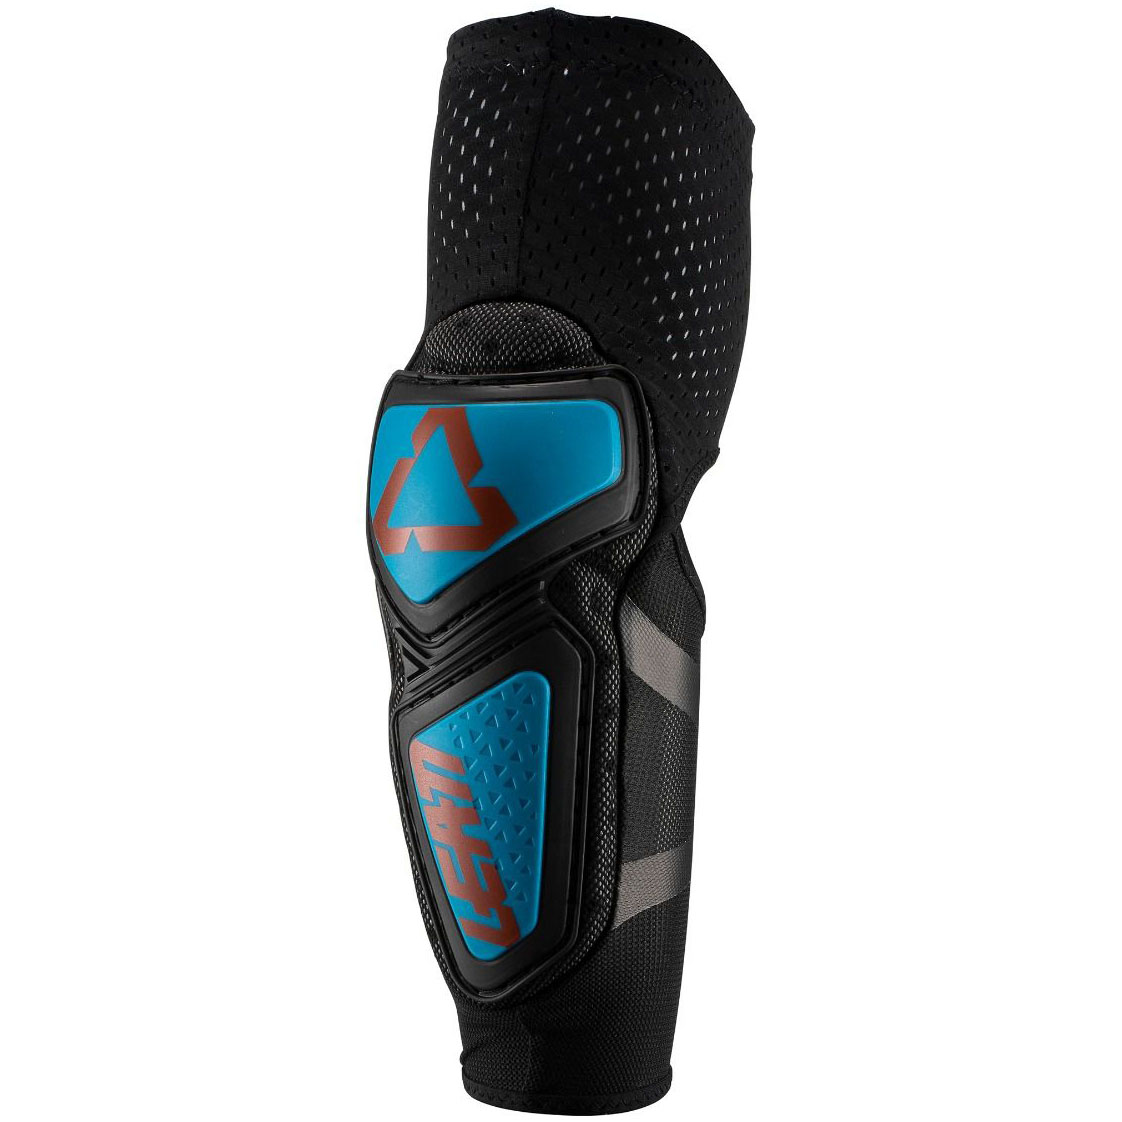 Leatt Contour Elbow Guard Fuel/Black защита локтей